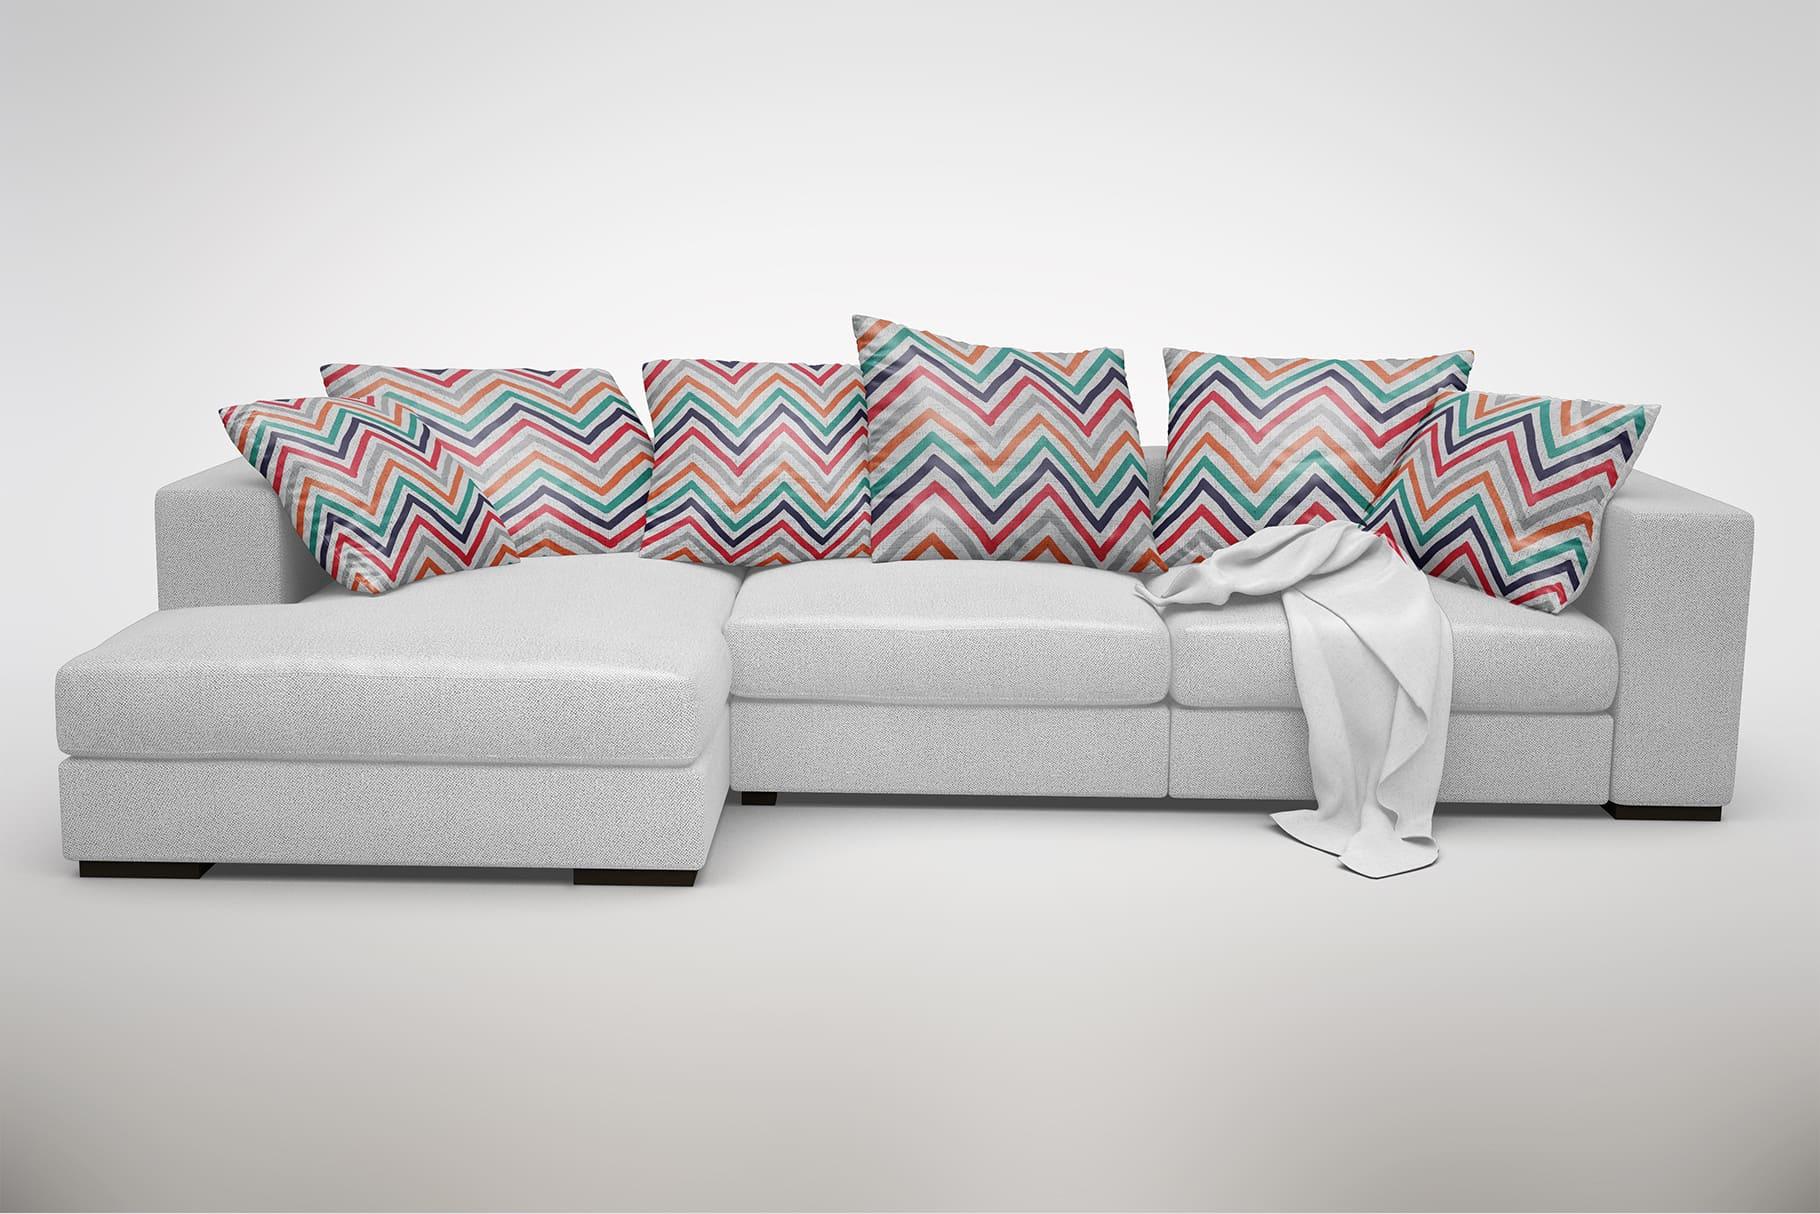 Decorative pillows with multicolored herringbone print.